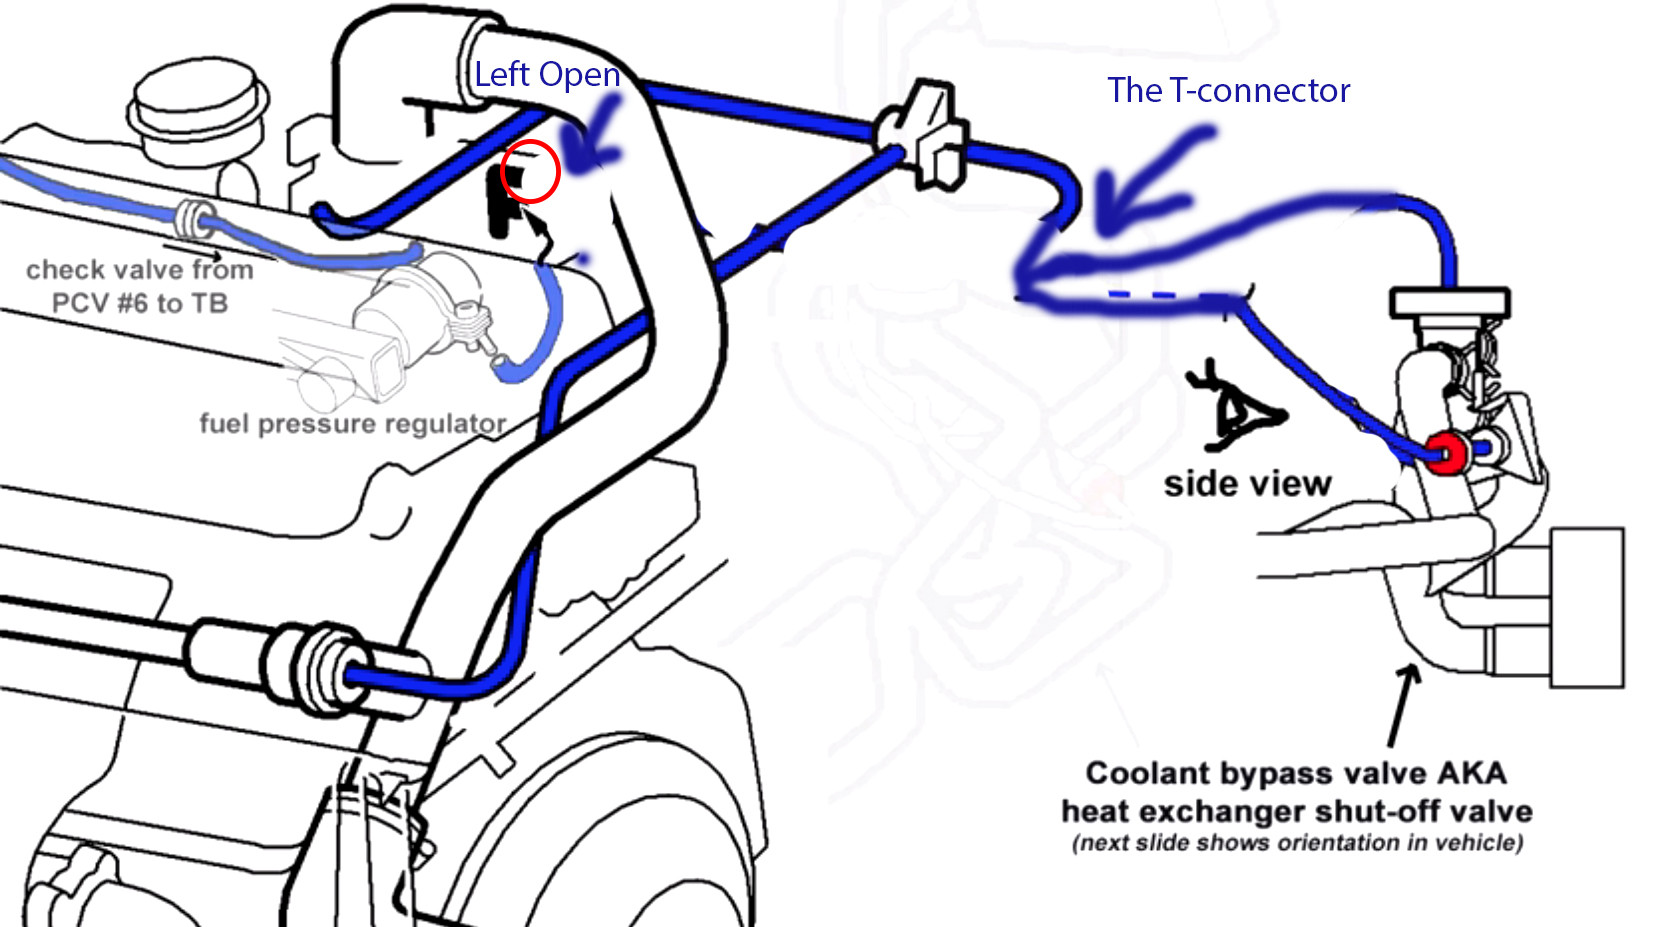 2002 saab 9 3 headlight wiring diagram sr 3185  saab 9 3 vacuum diagram schematic wiring  saab 9 3 vacuum diagram schematic wiring